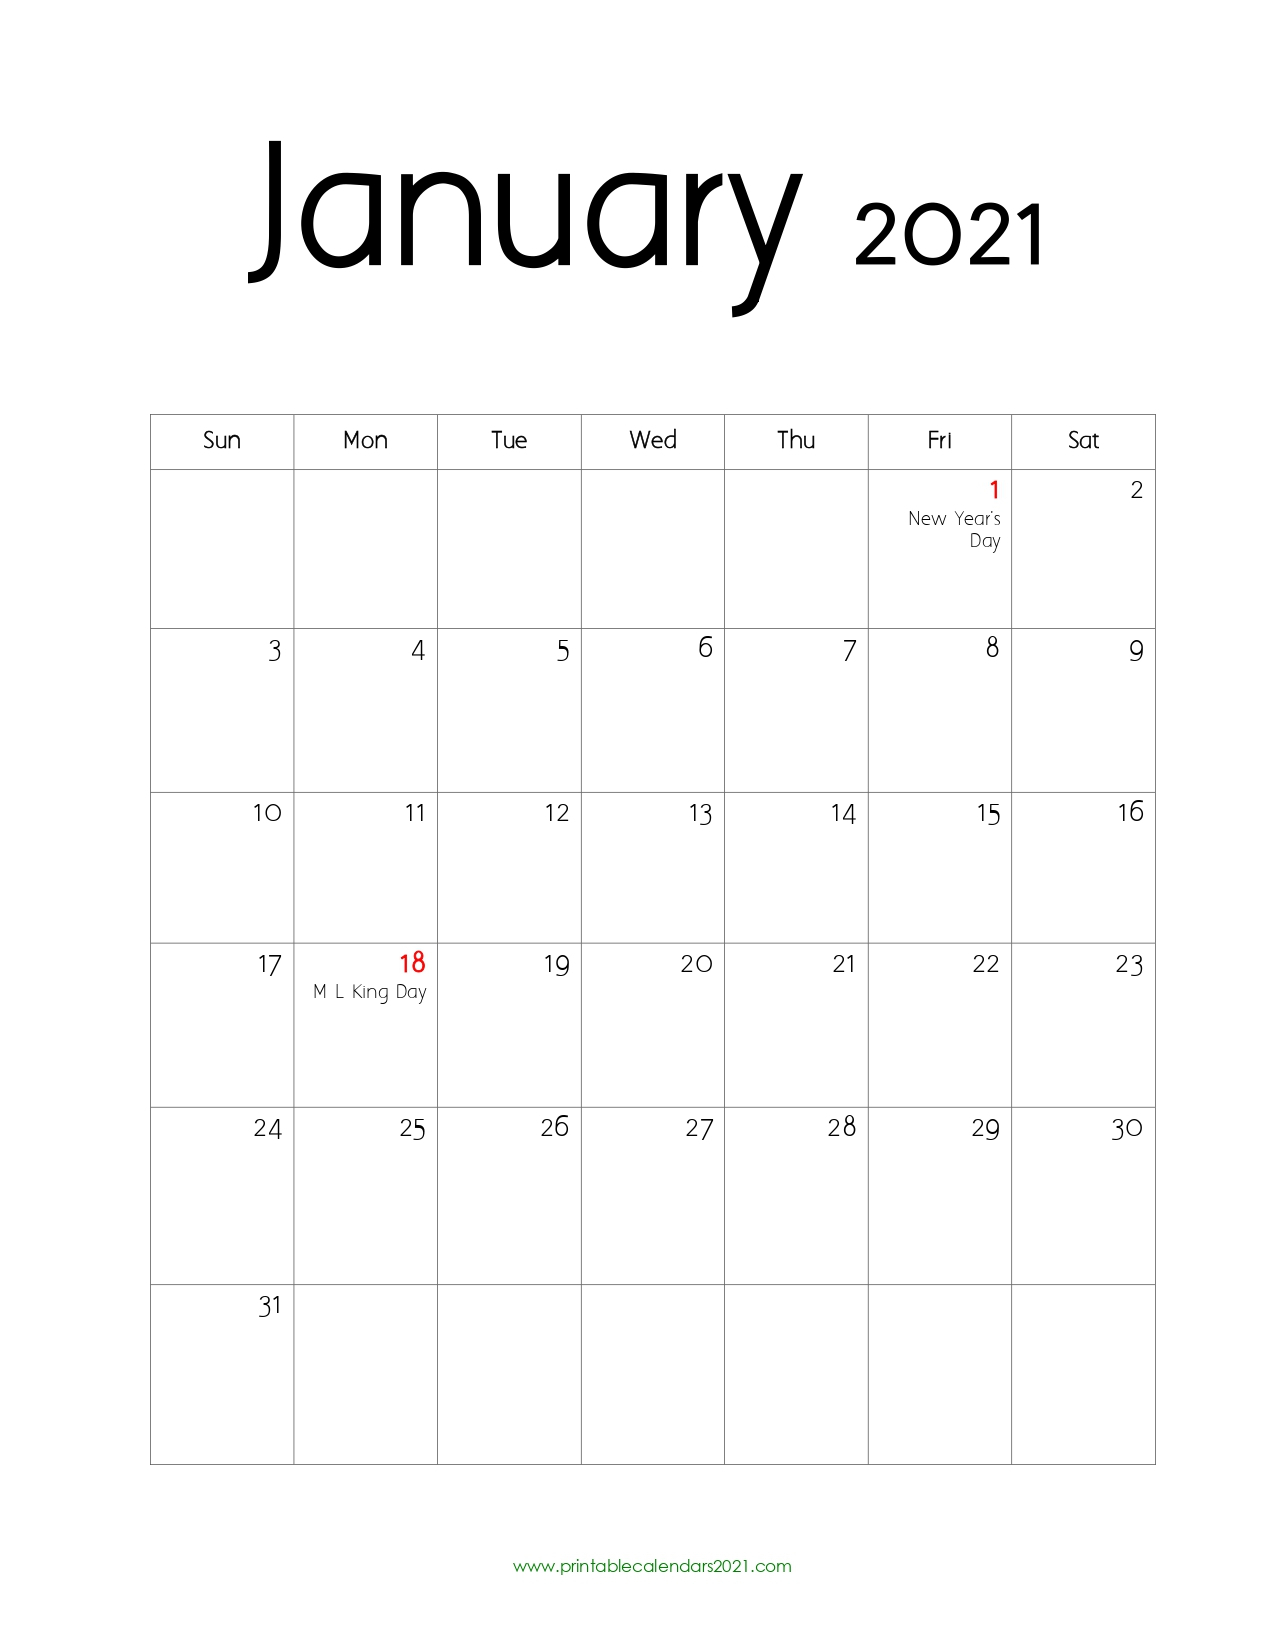 65 January 2022 Calendar Printable January 2022 Calendar